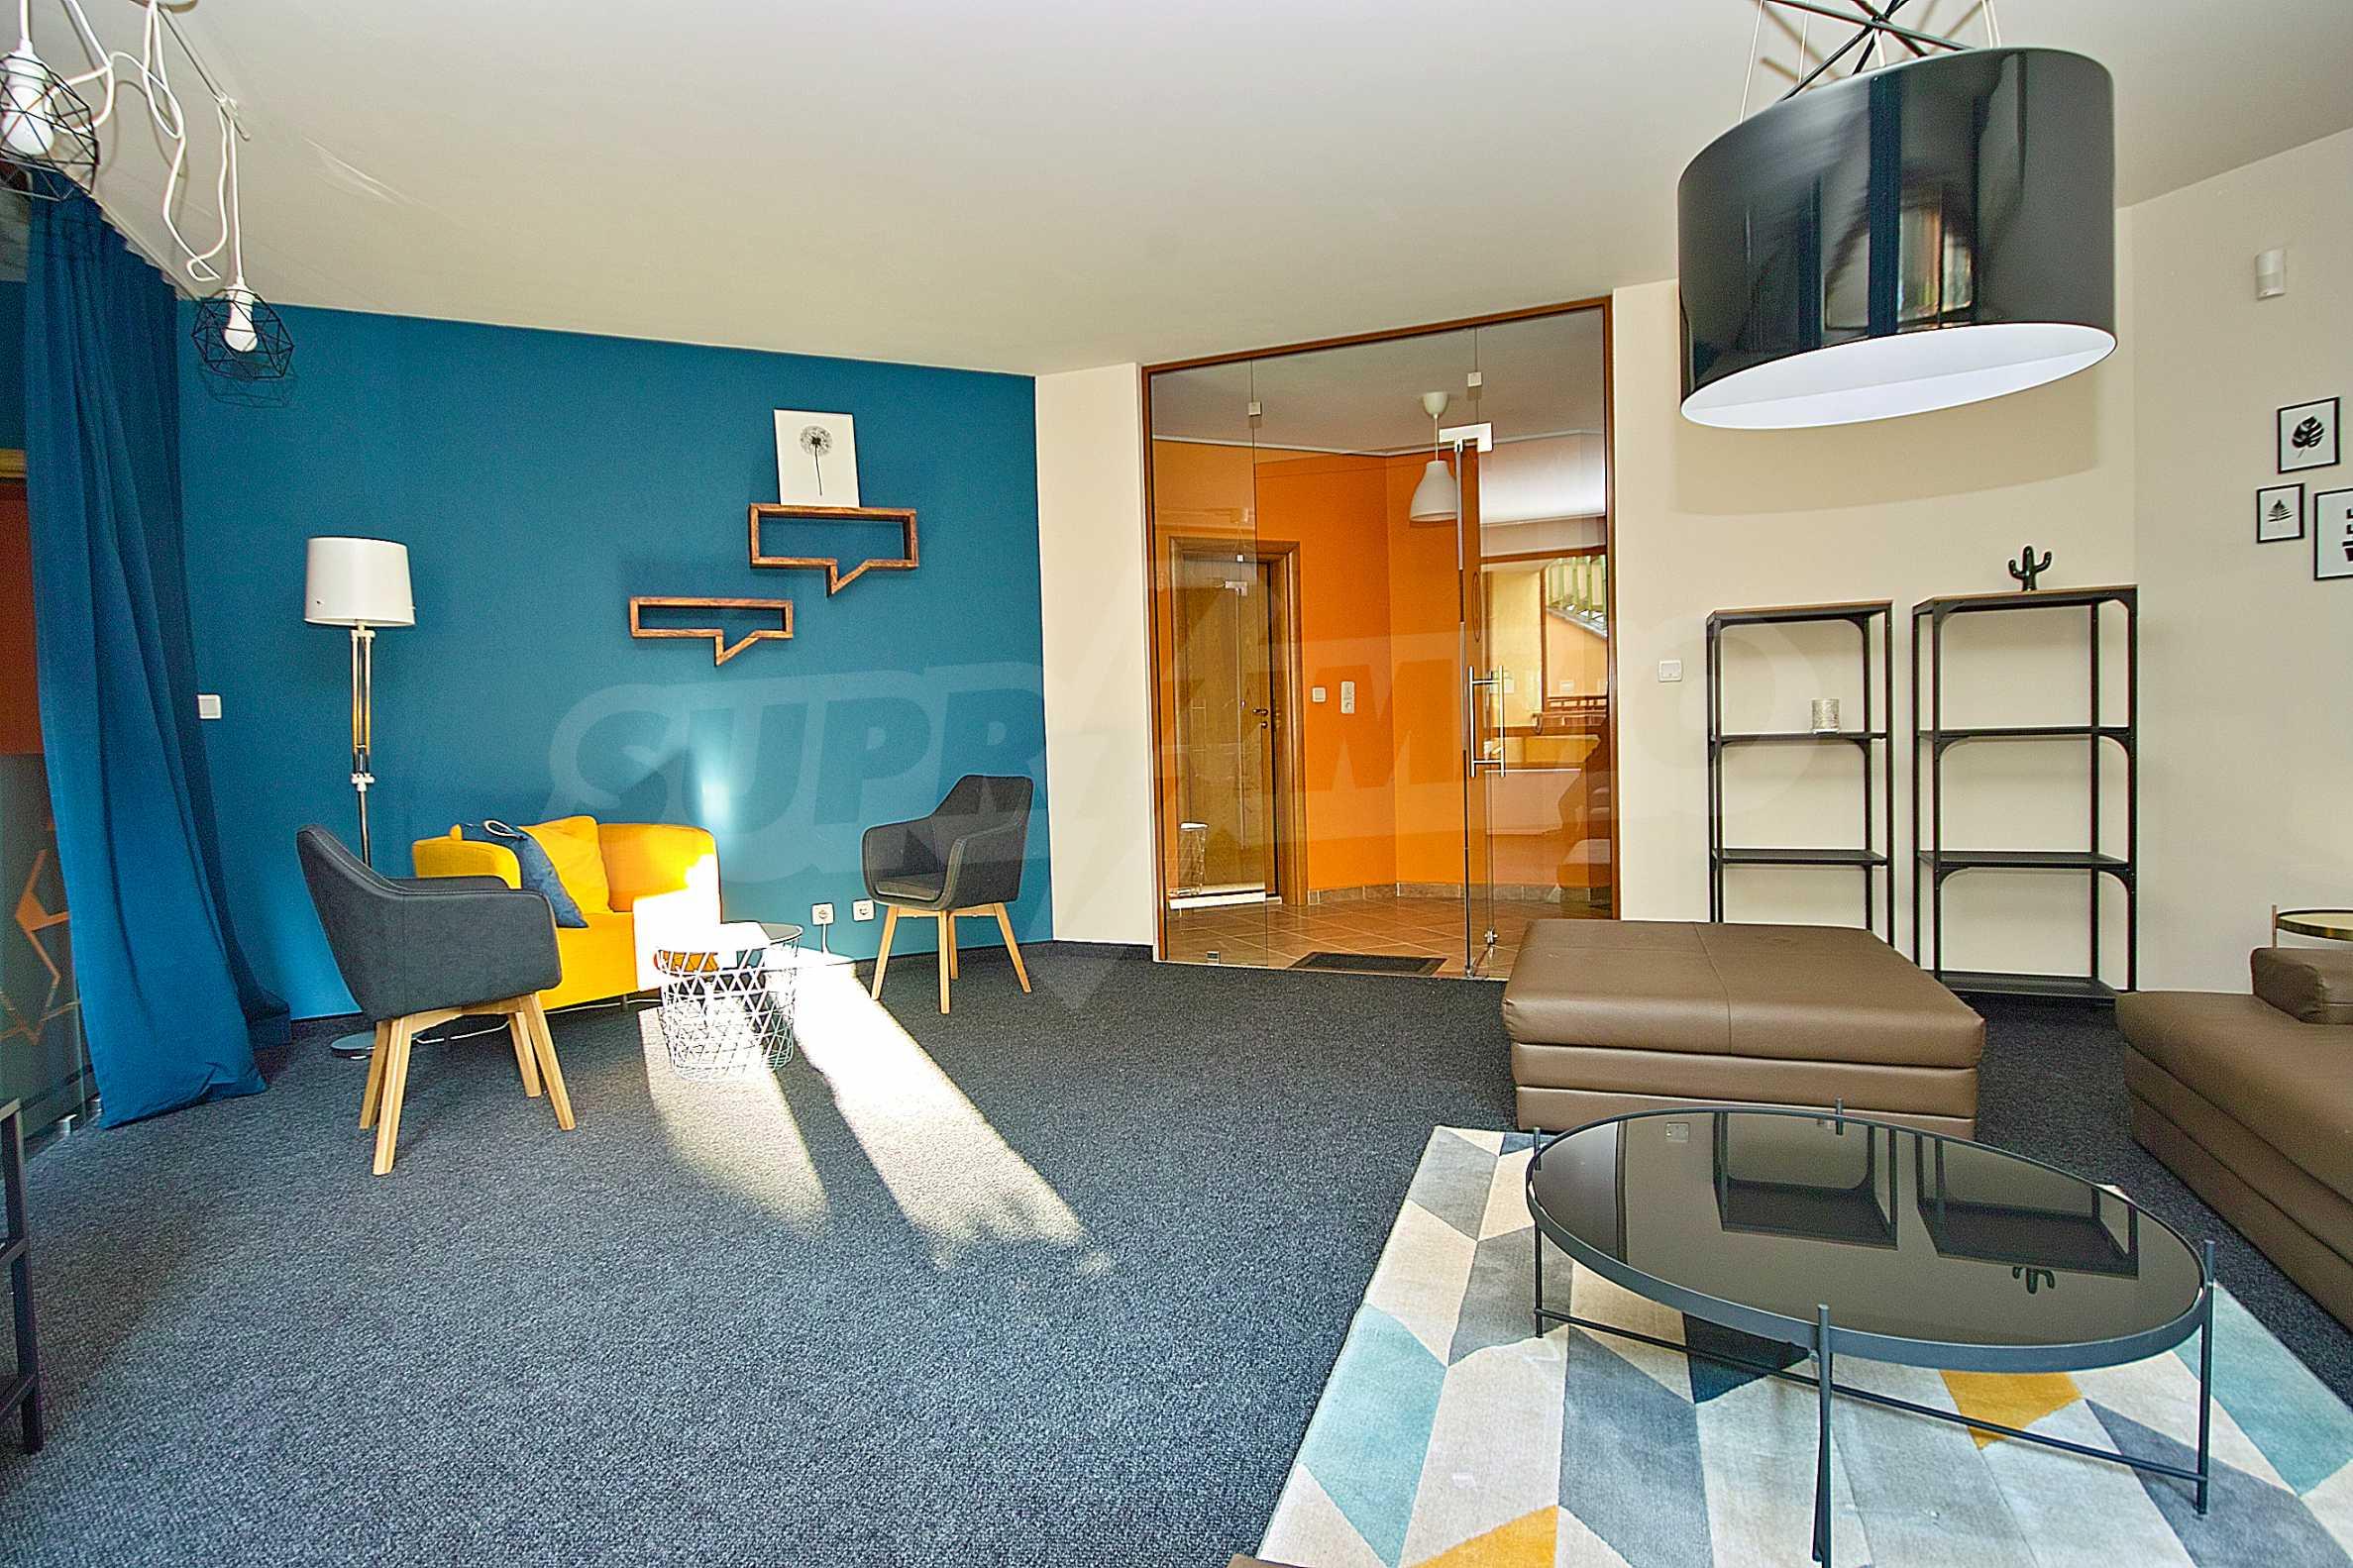 3-bedroom apartment for rent in Sofia, Bulgaria - Rentals - 3-bedroom apartment.